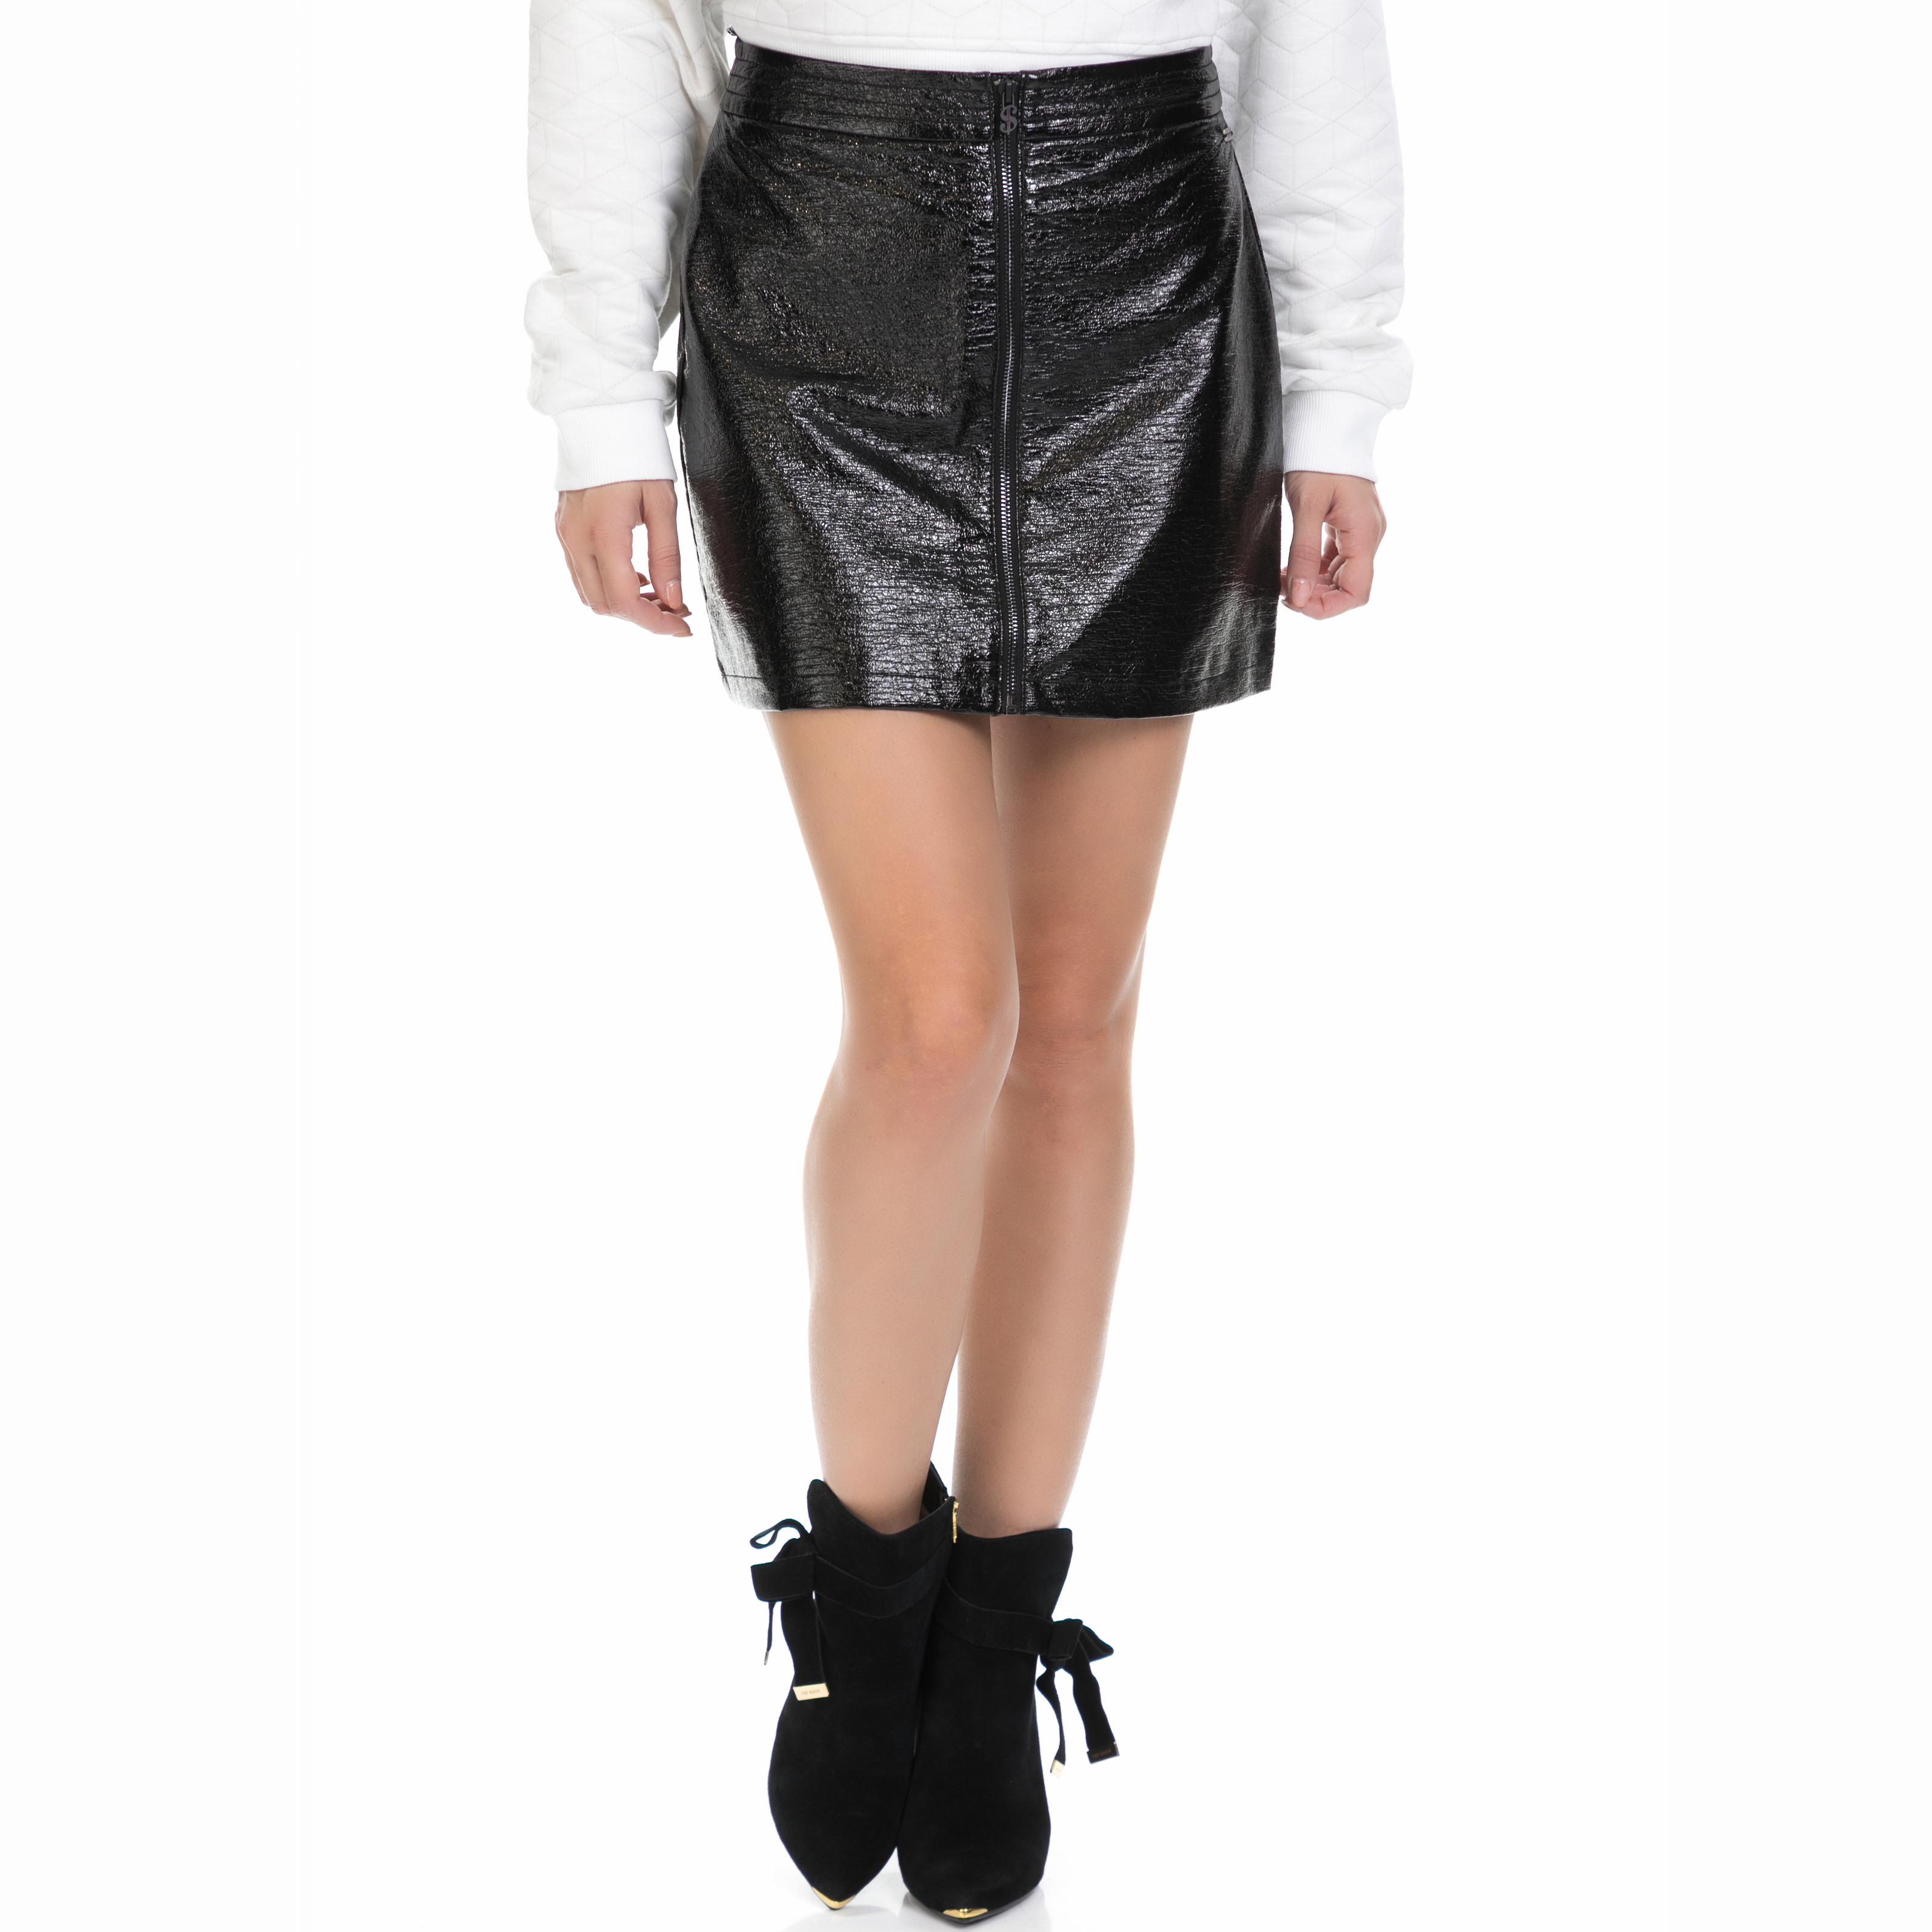 ANDY WARHOL - Γυναικεία μίνι φούστα ANDY WARHOL STUDIO μαύρη γυναικεία ρούχα φούστες μίνι